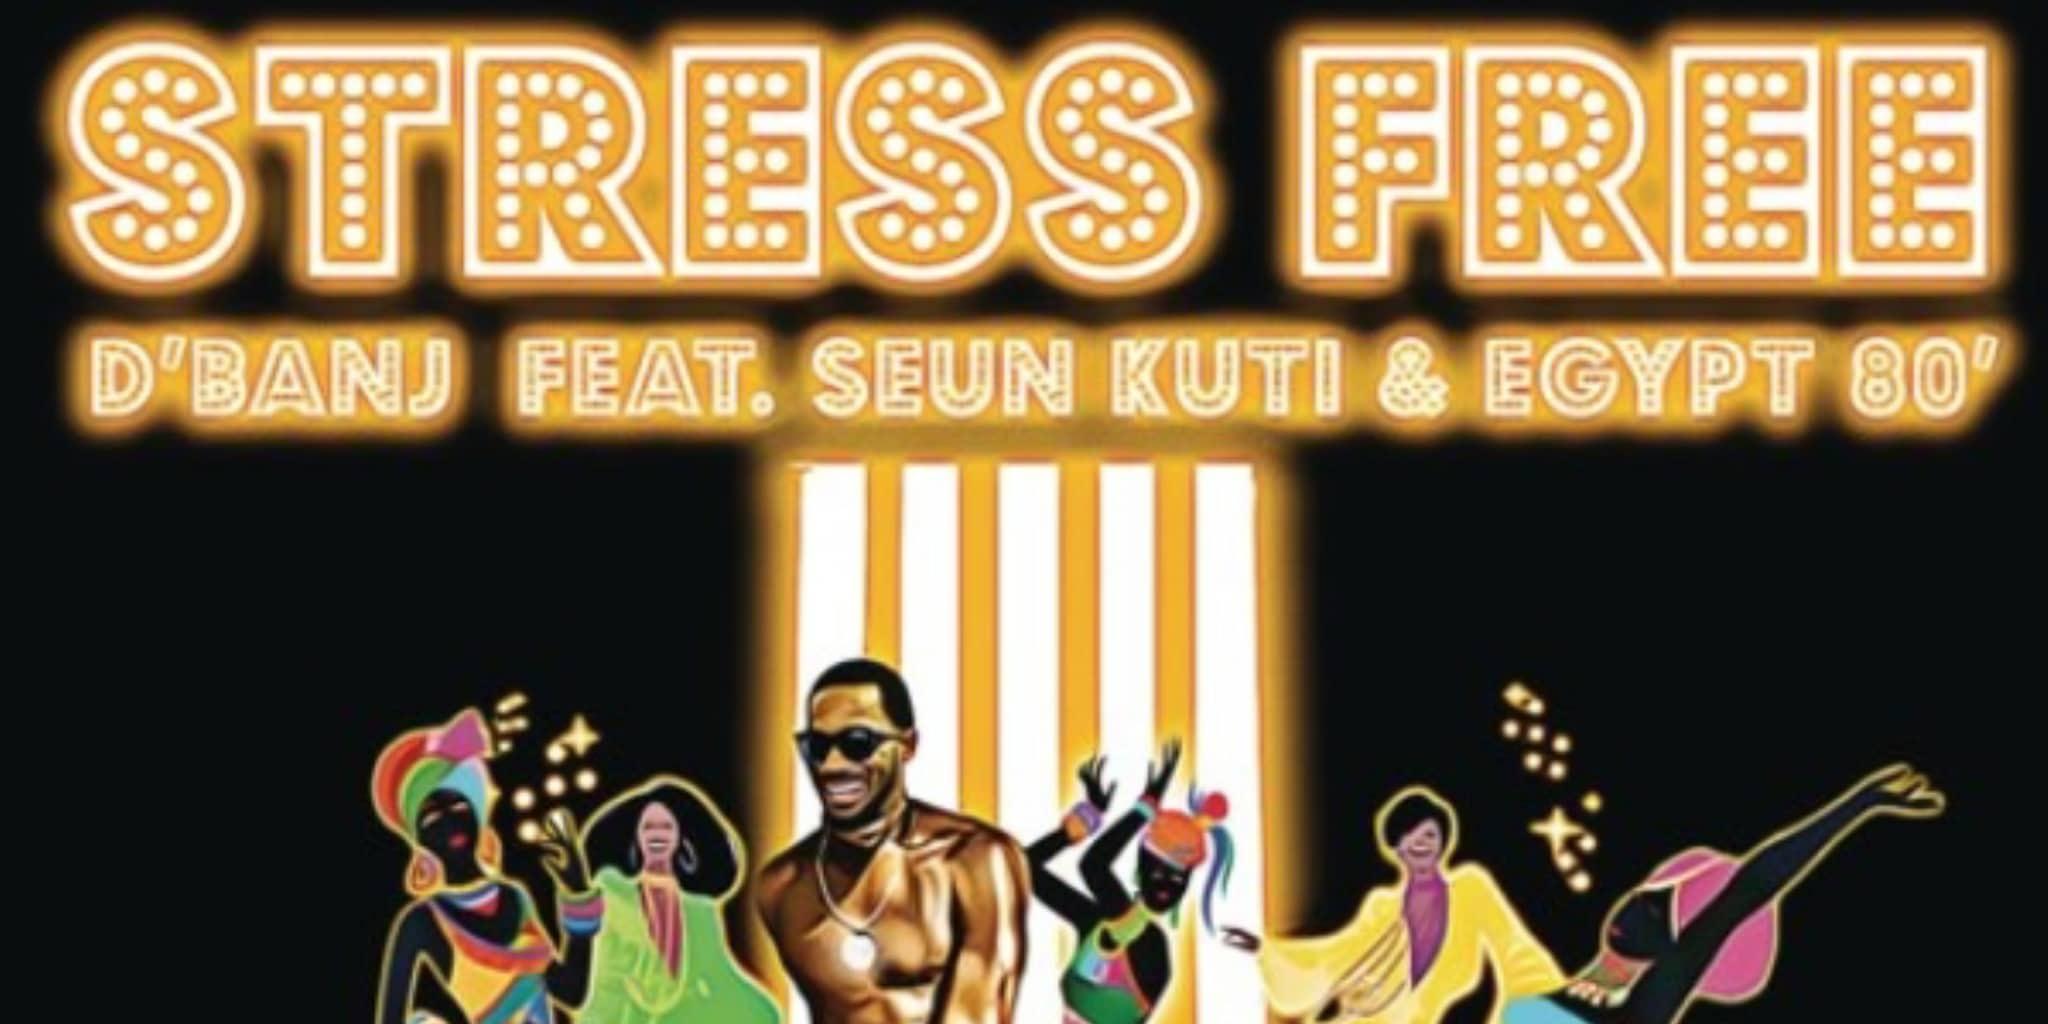 Music video: D'banj ft. Seun Kuti, Egypt 80 - Stress Free